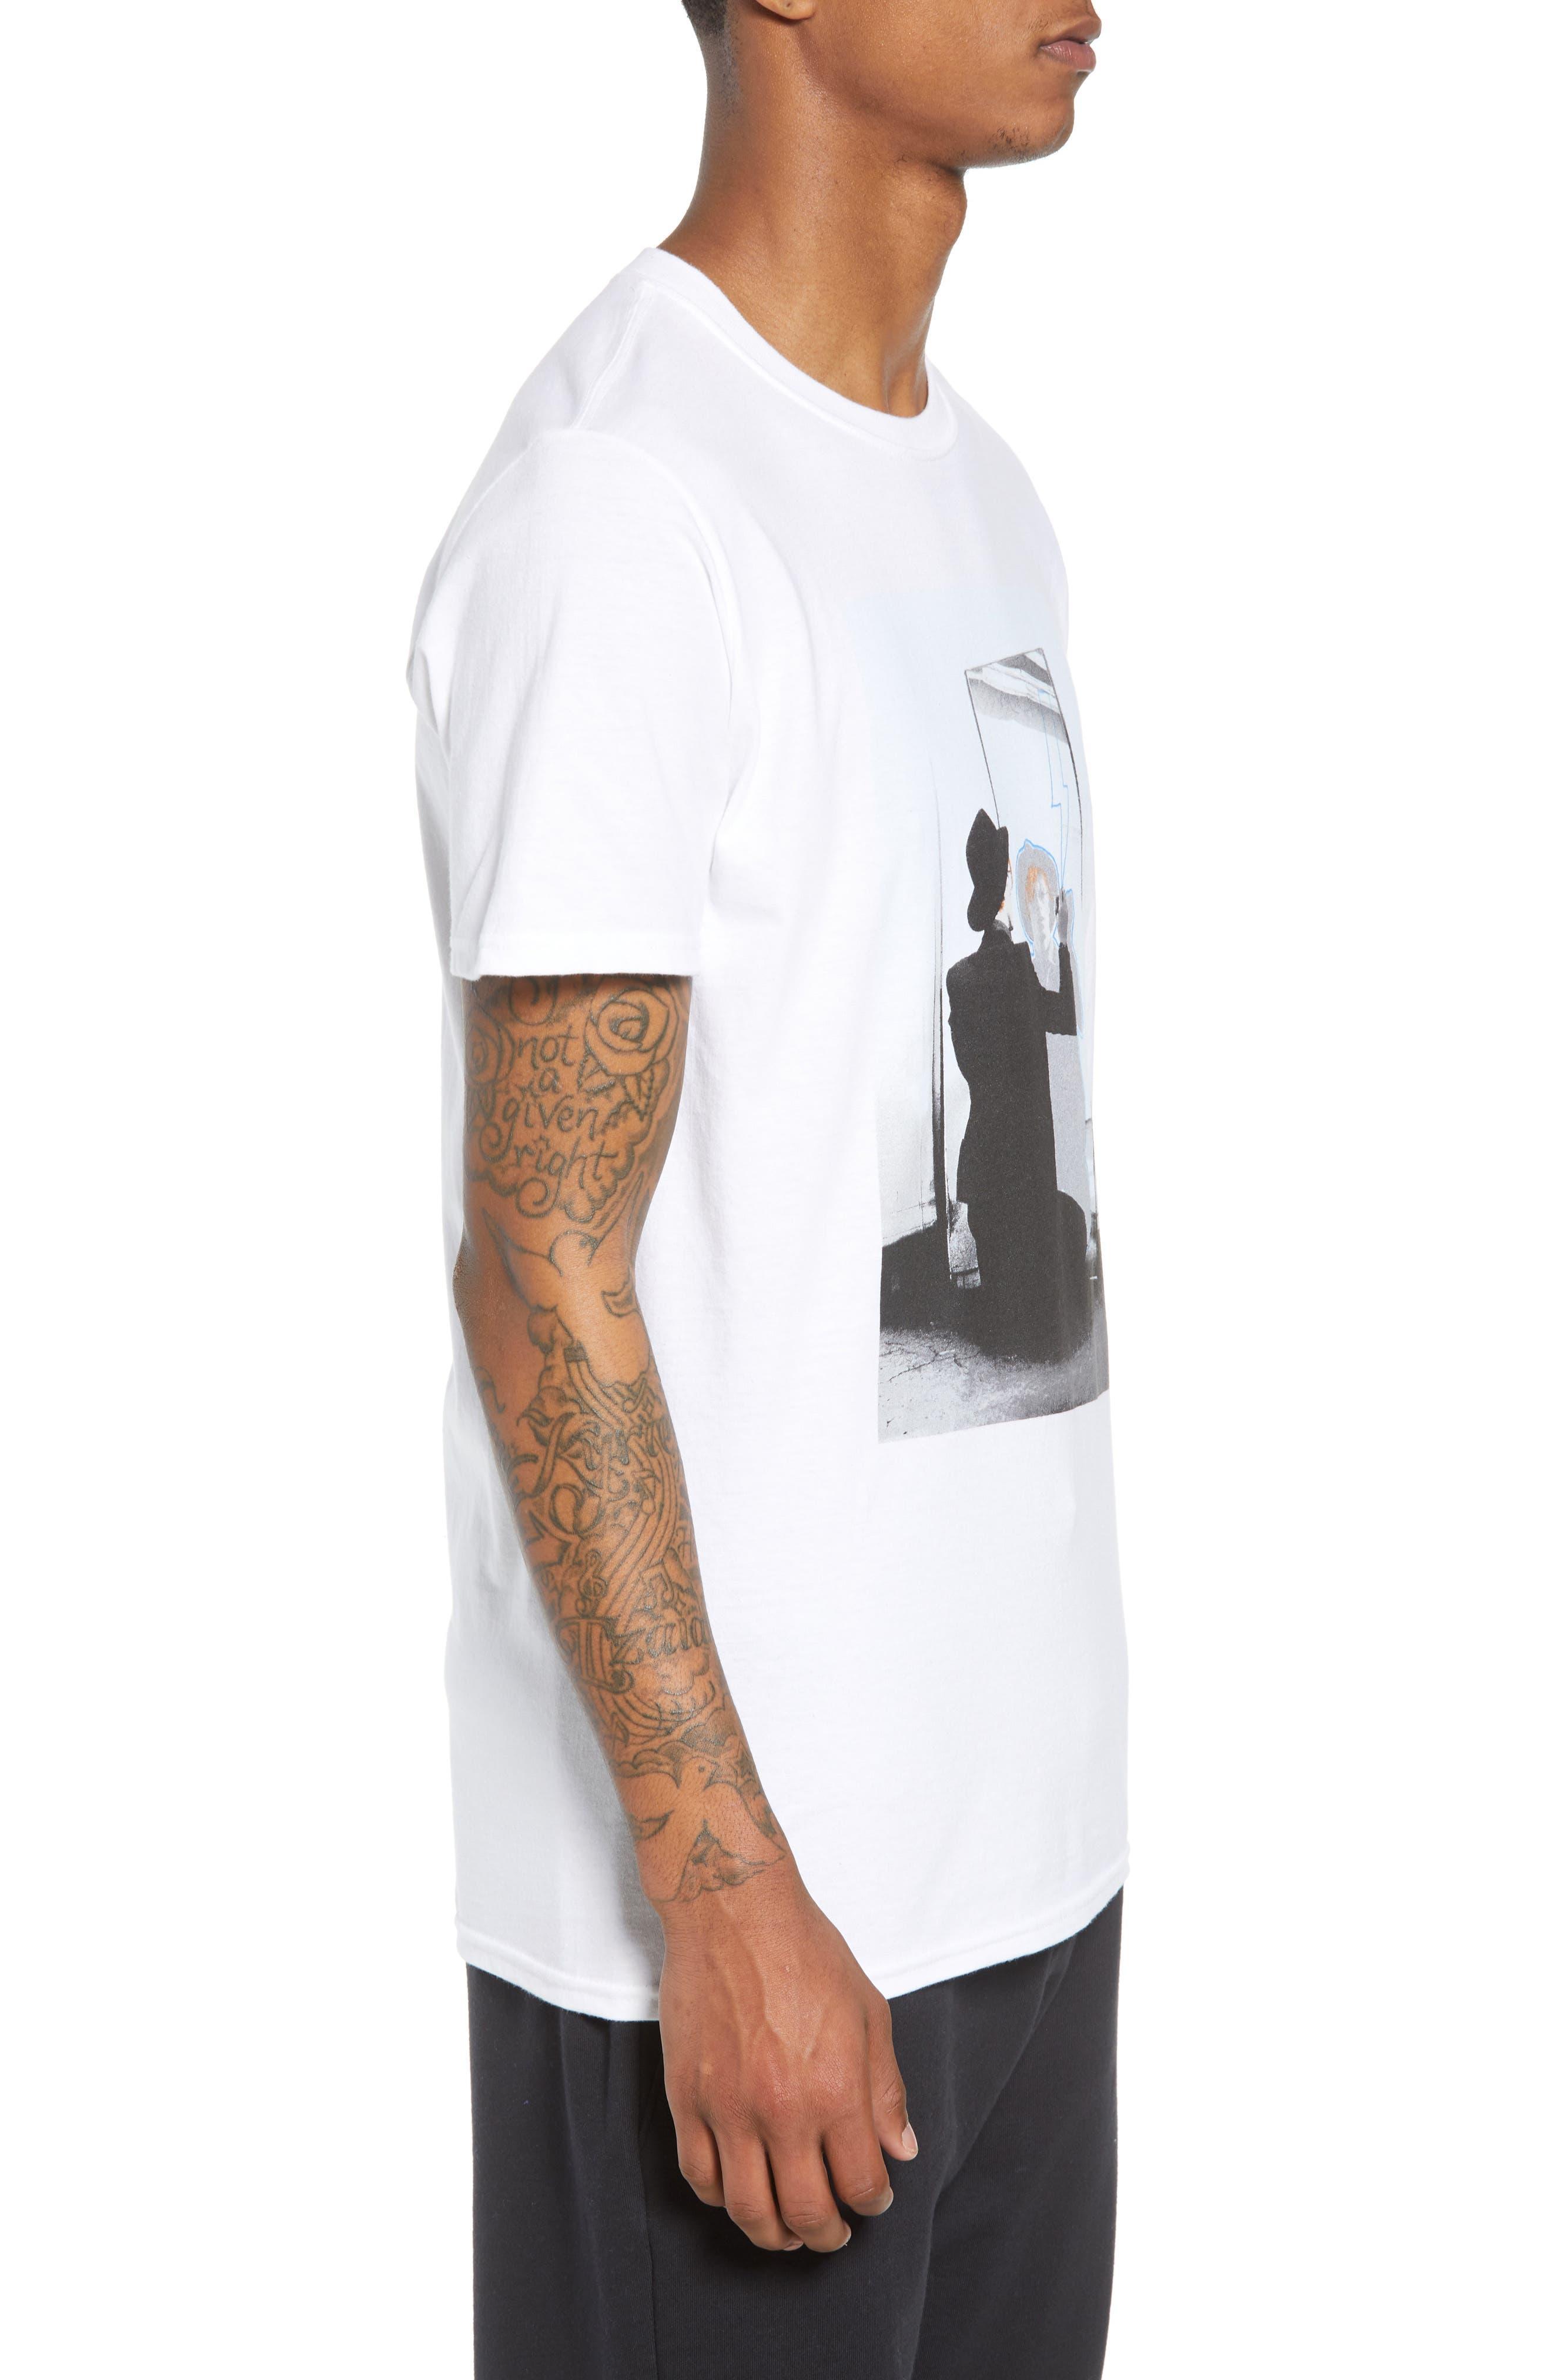 David Bowie Mirror T-Shirt,                             Alternate thumbnail 3, color,                             White Bowie Mirror